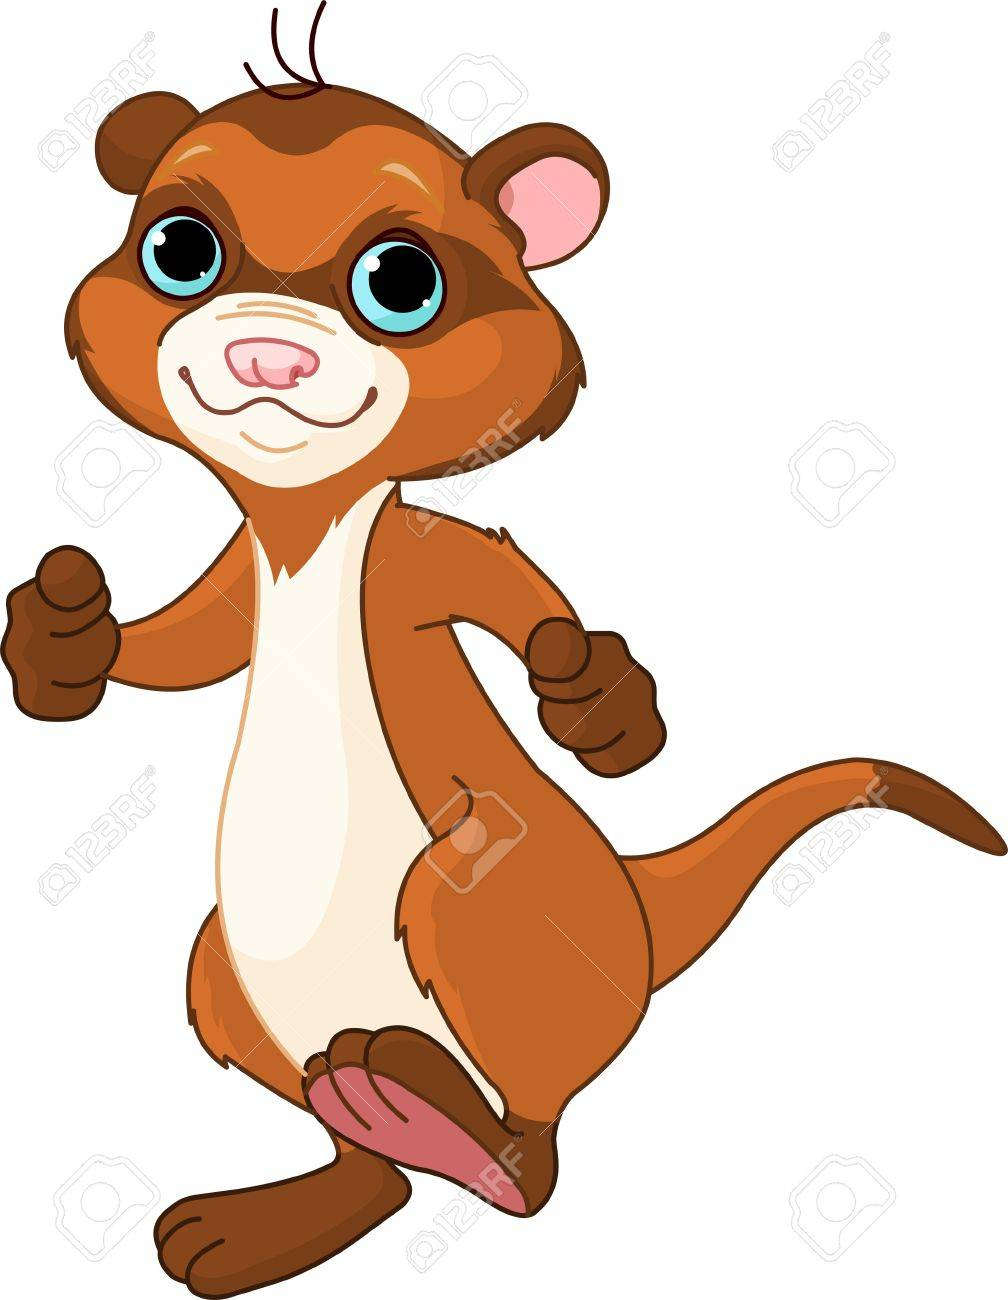 889 ferret cliparts stock vector and royalty free ferret illustrations rh 123rf com ferret clipart